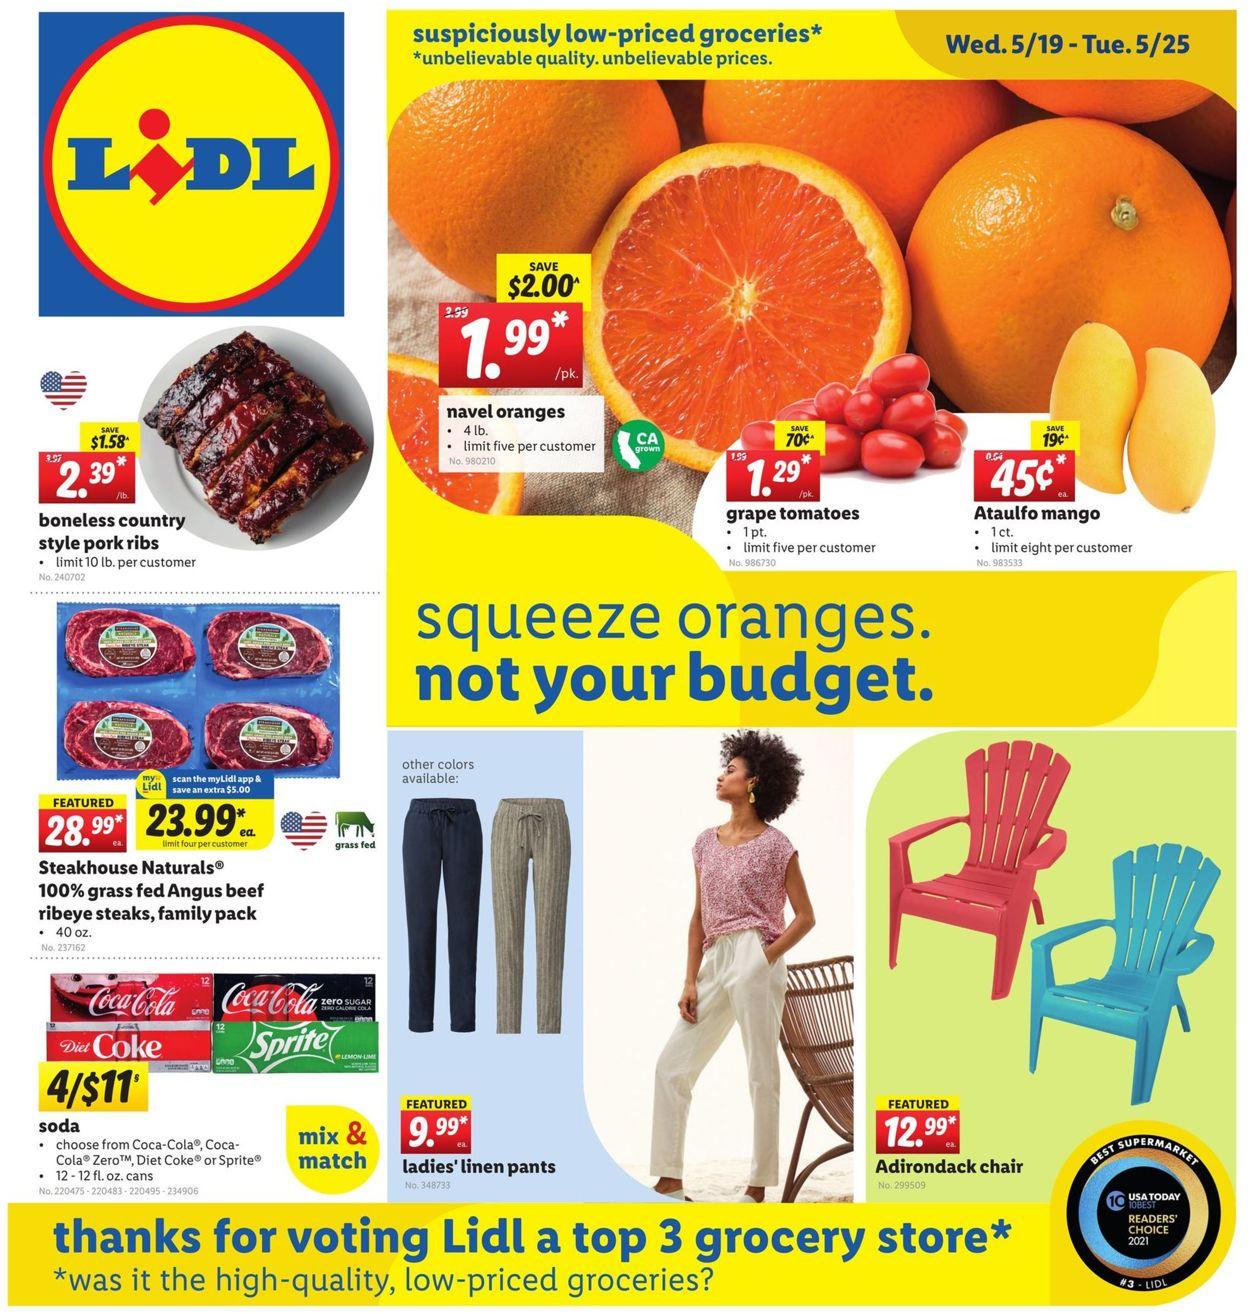 Lidl Weekly Ad Circular - valid 05/19-05/25/2021